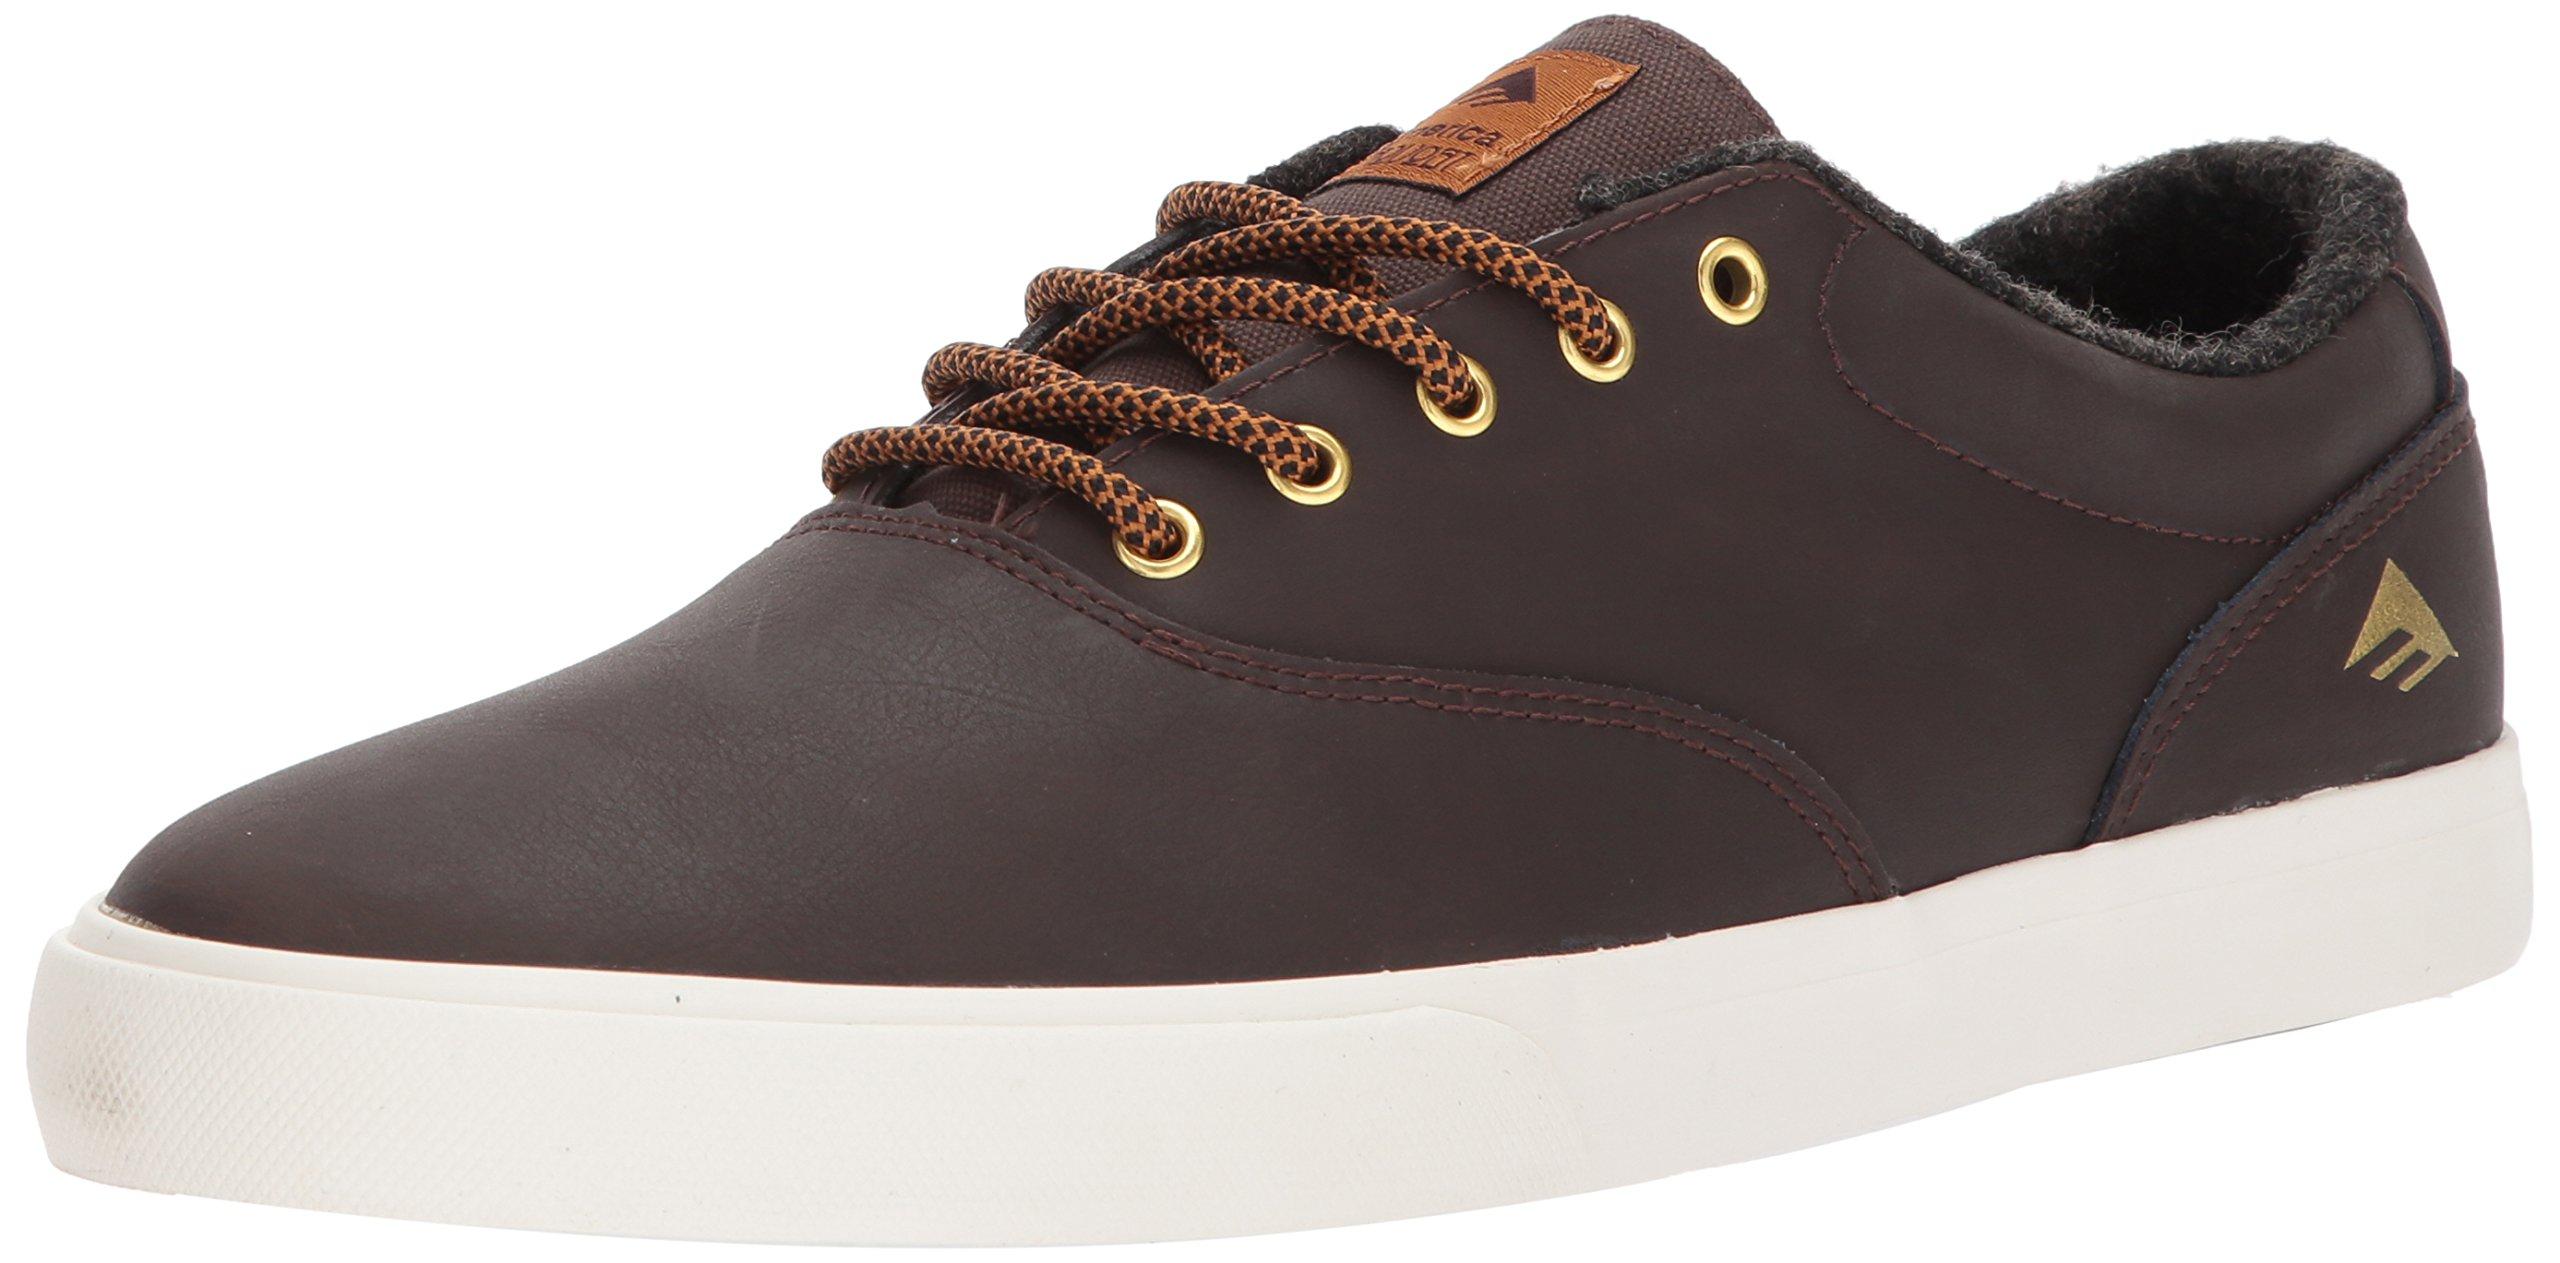 Emerica Provost Slim Vulc Skate Shoe,Brown,10.5